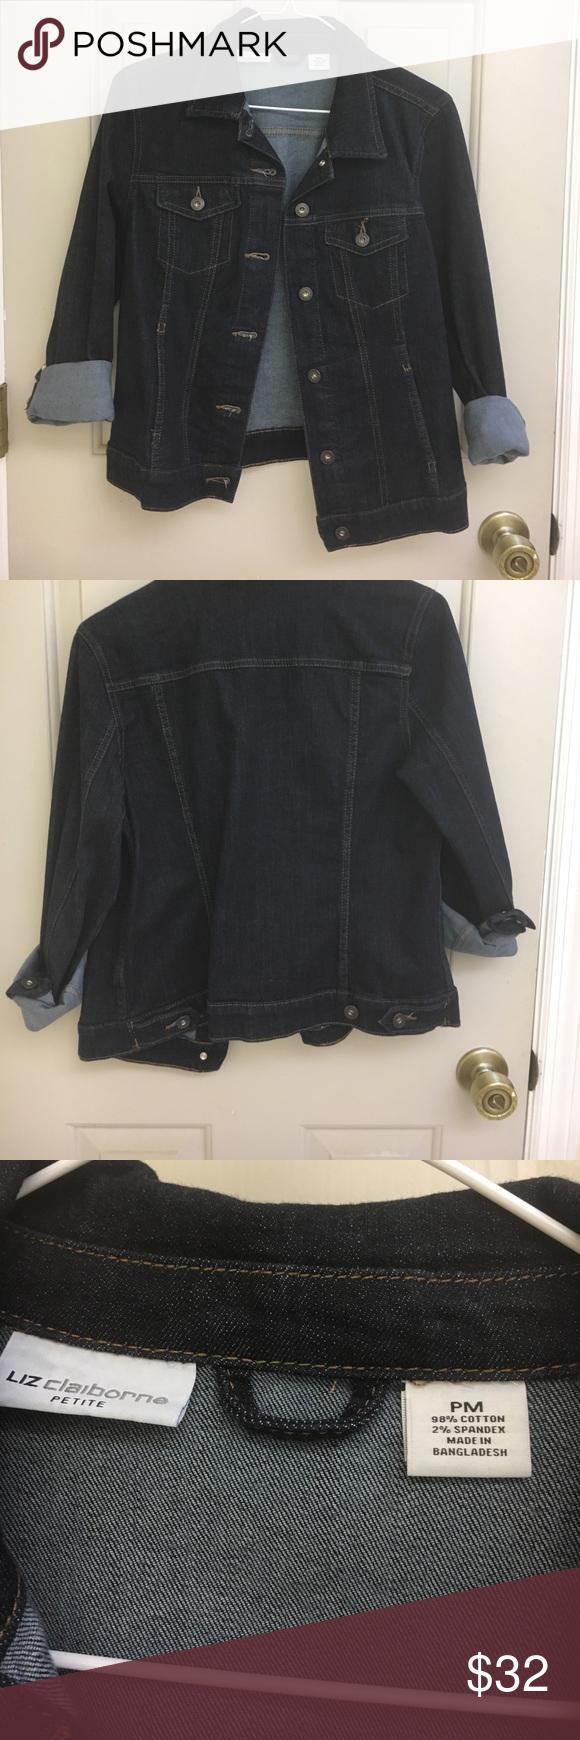 Dark jean jacket! Liz Claiborne dark jean jacket. It is petite medium. Lightly worn. I am selling it because a got a new one. Liz Claiborne Jackets & Coats Jean Jackets